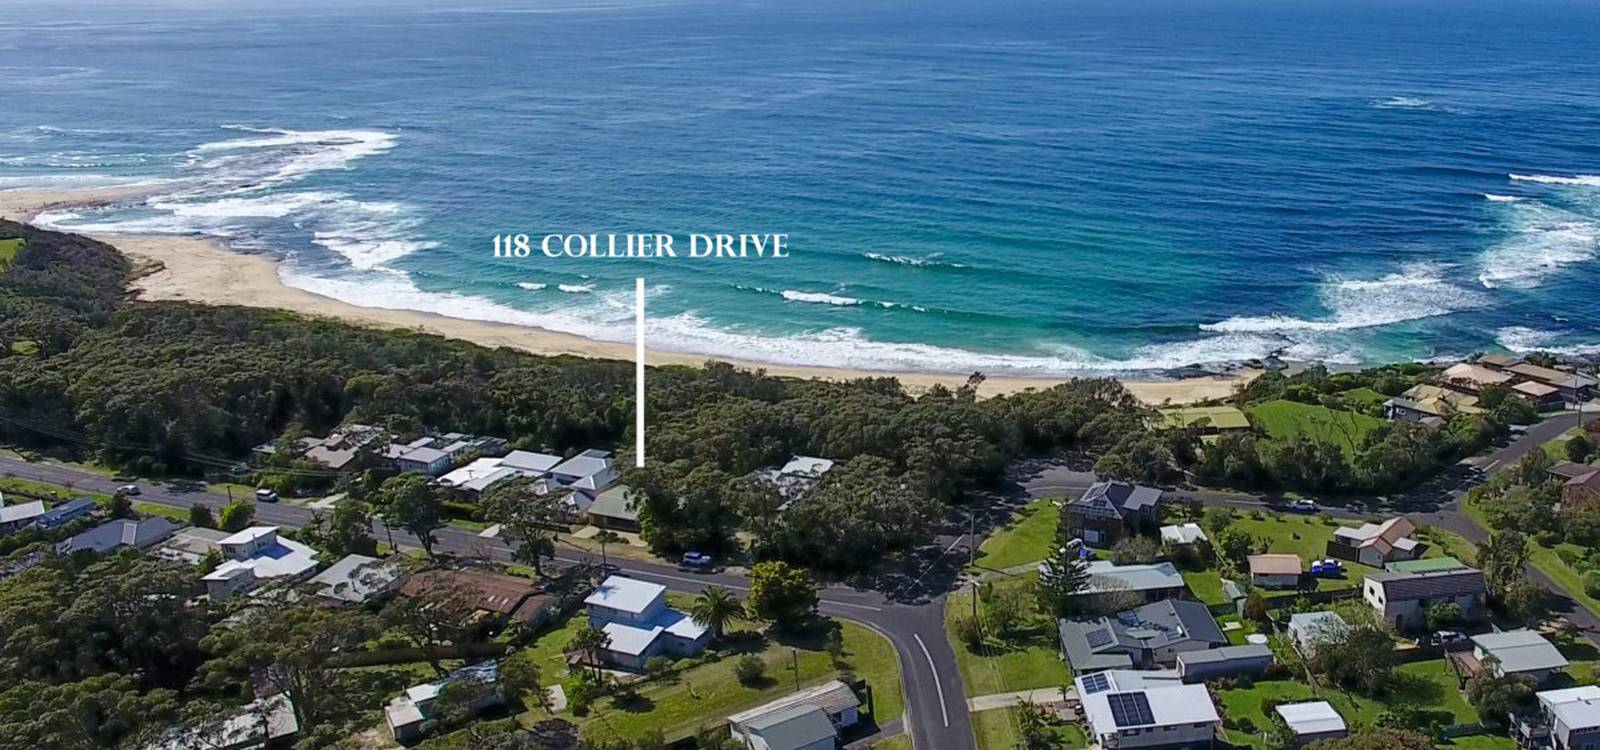 118 Collier Drive BERRARA, NSW 2540 - photo 1